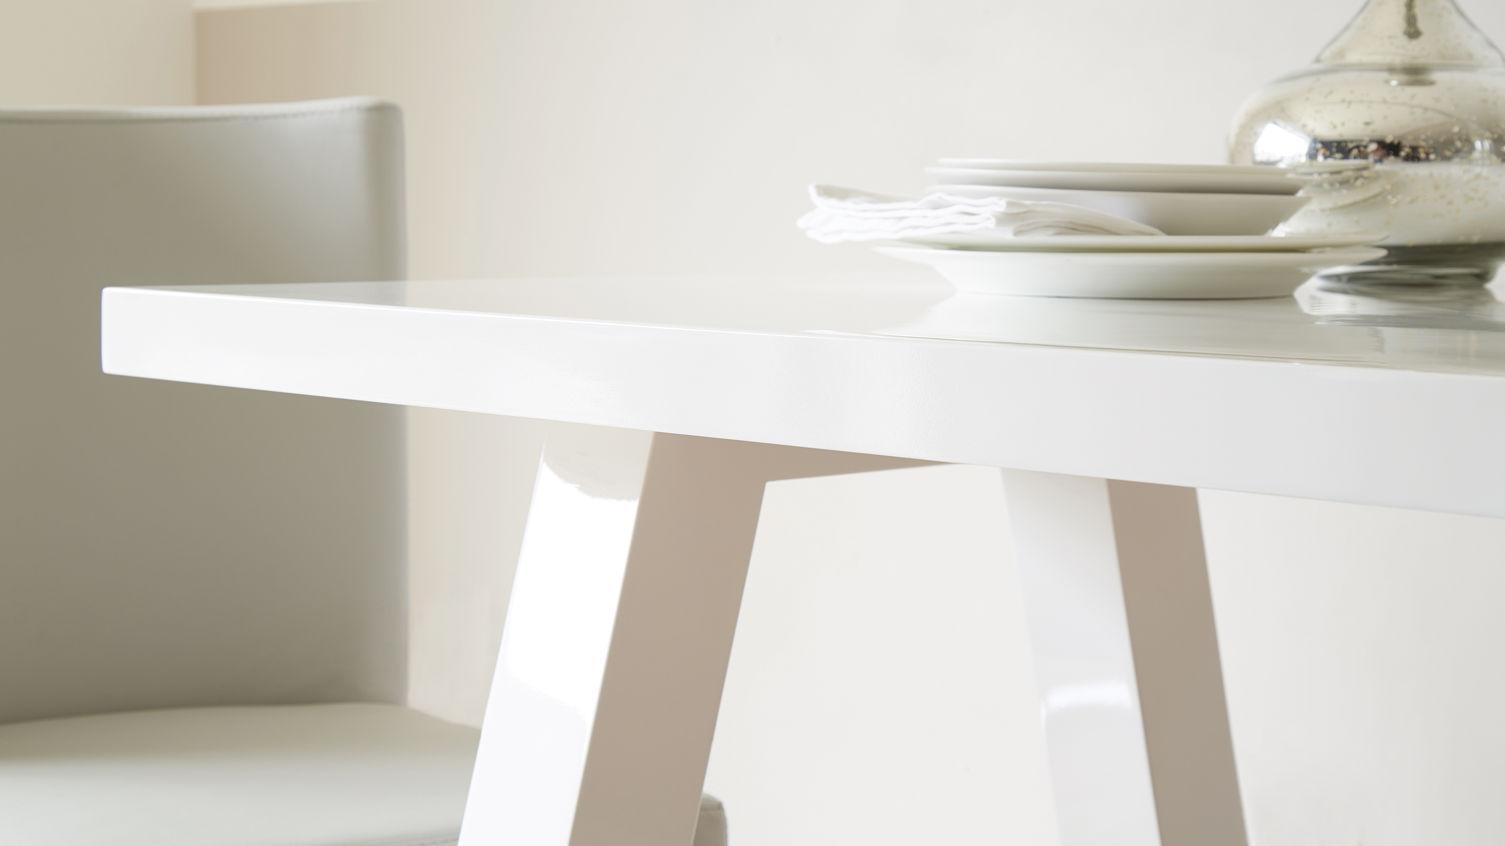 White Gloss Table Finish - Zen 6 Seater White Gloss Dining Table